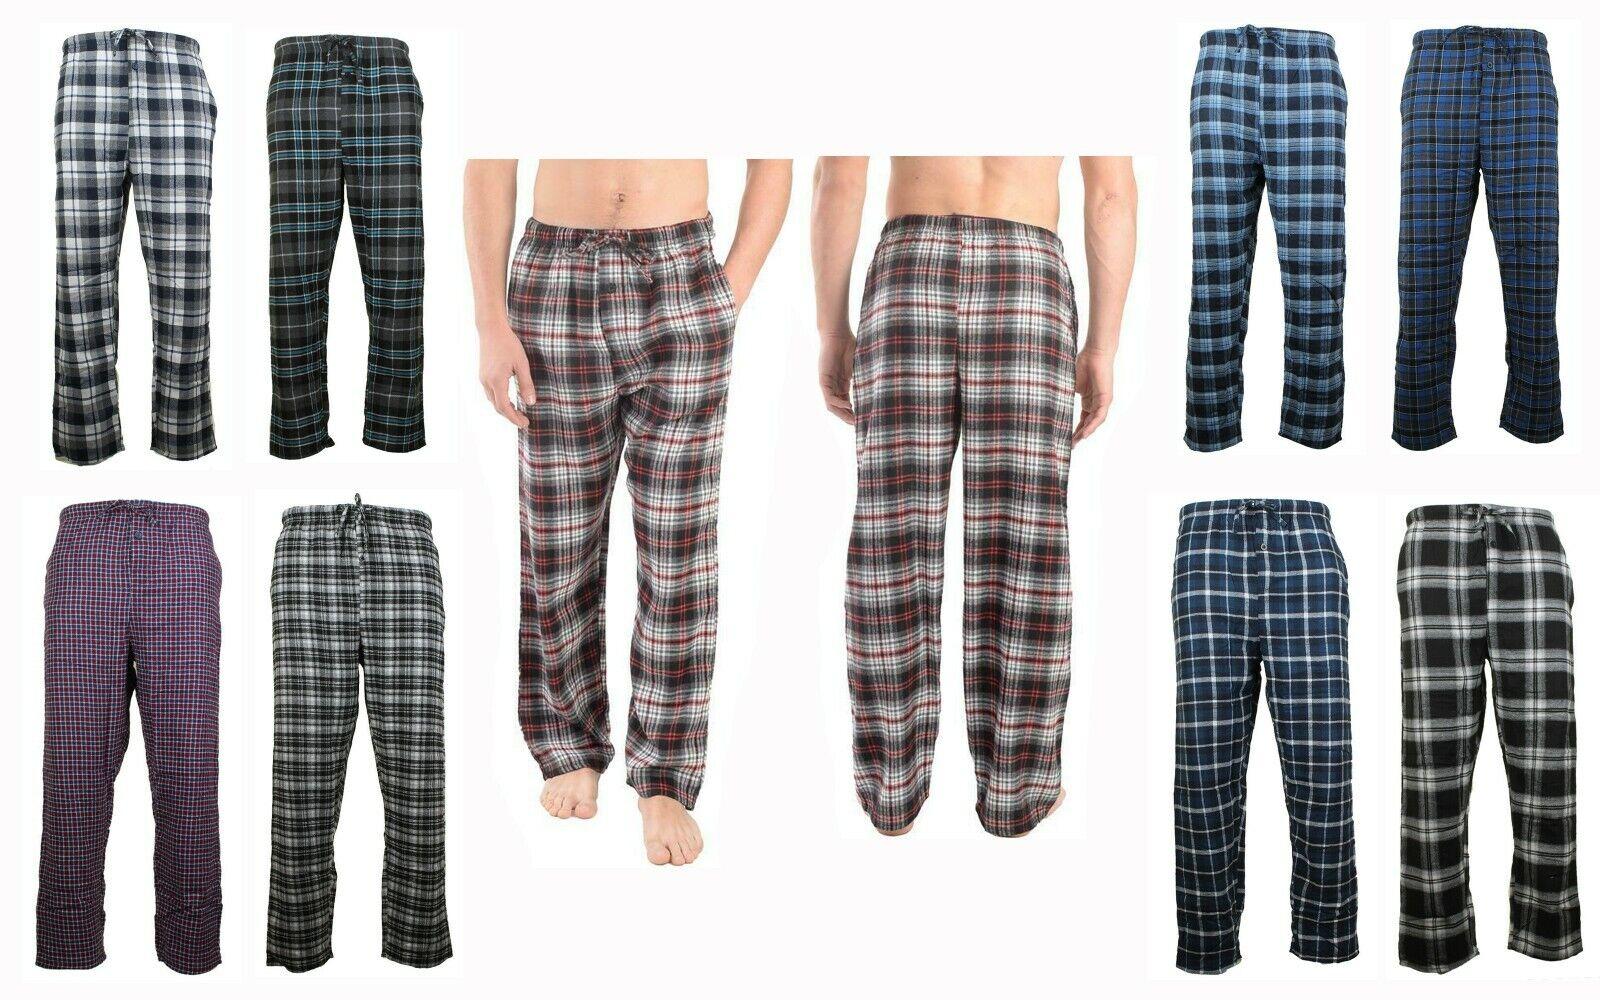 Sesame Street Cookie Monster Mens Sleep Lounge Pajama Pants XL for sale  online | eBay